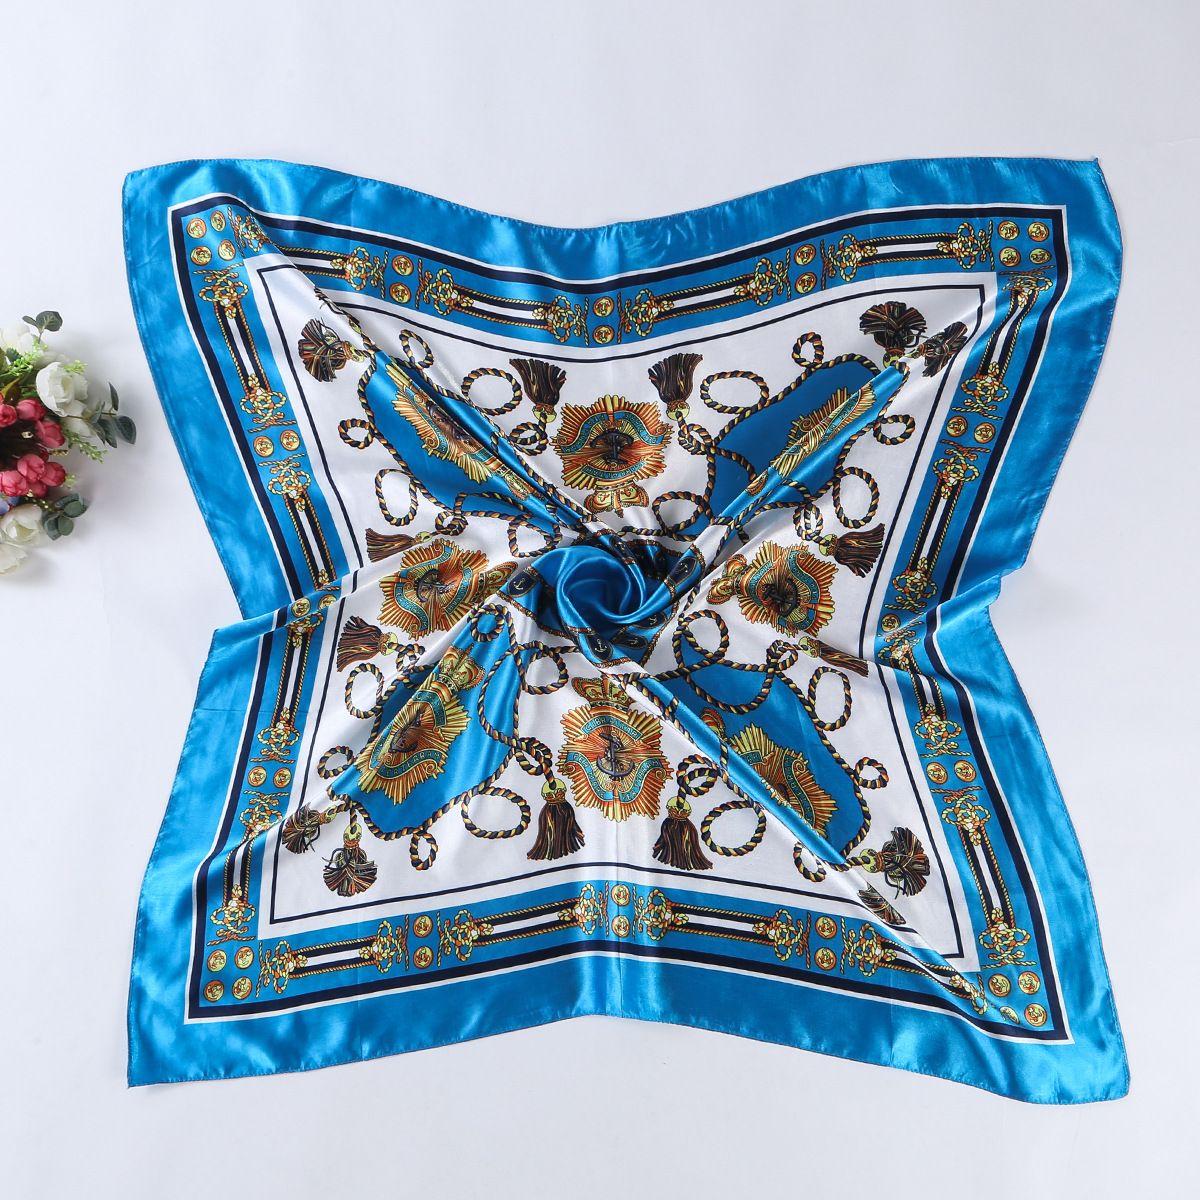 New Fashion Tassel Belt Print Satin 90cm Square Scarf Women Good Quality Large Size Imitated Silk Scarves Polyester Shawl Hijab A90SDFJ004